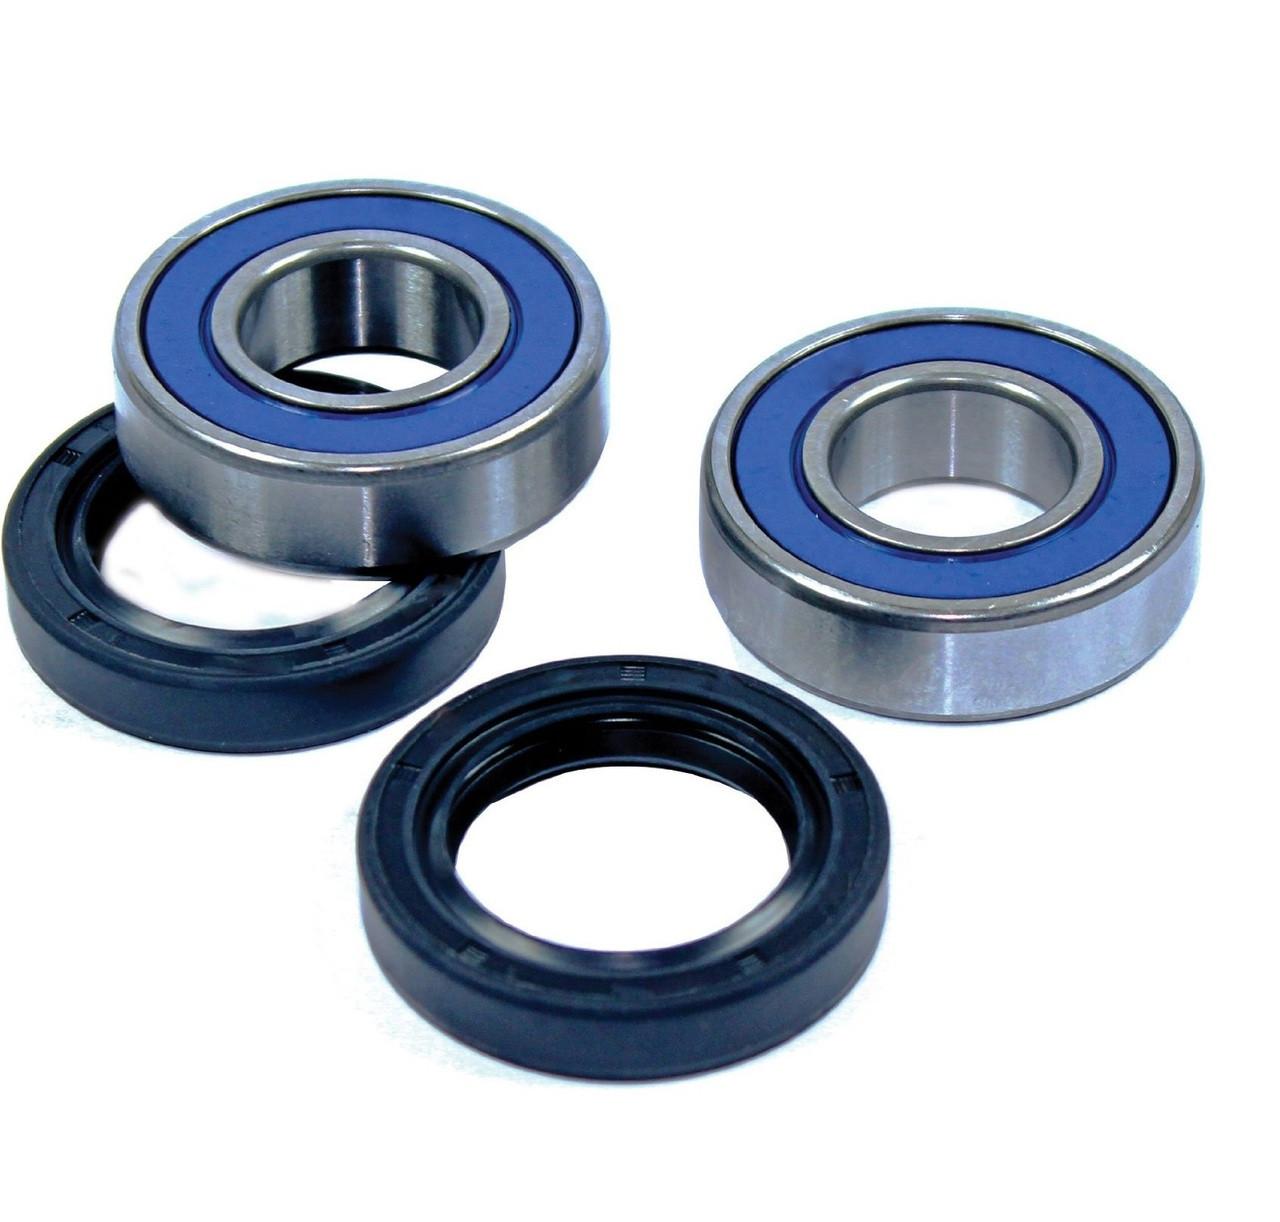 Atv Wheel Weights : Honda atc atv rear wheel bearing kit